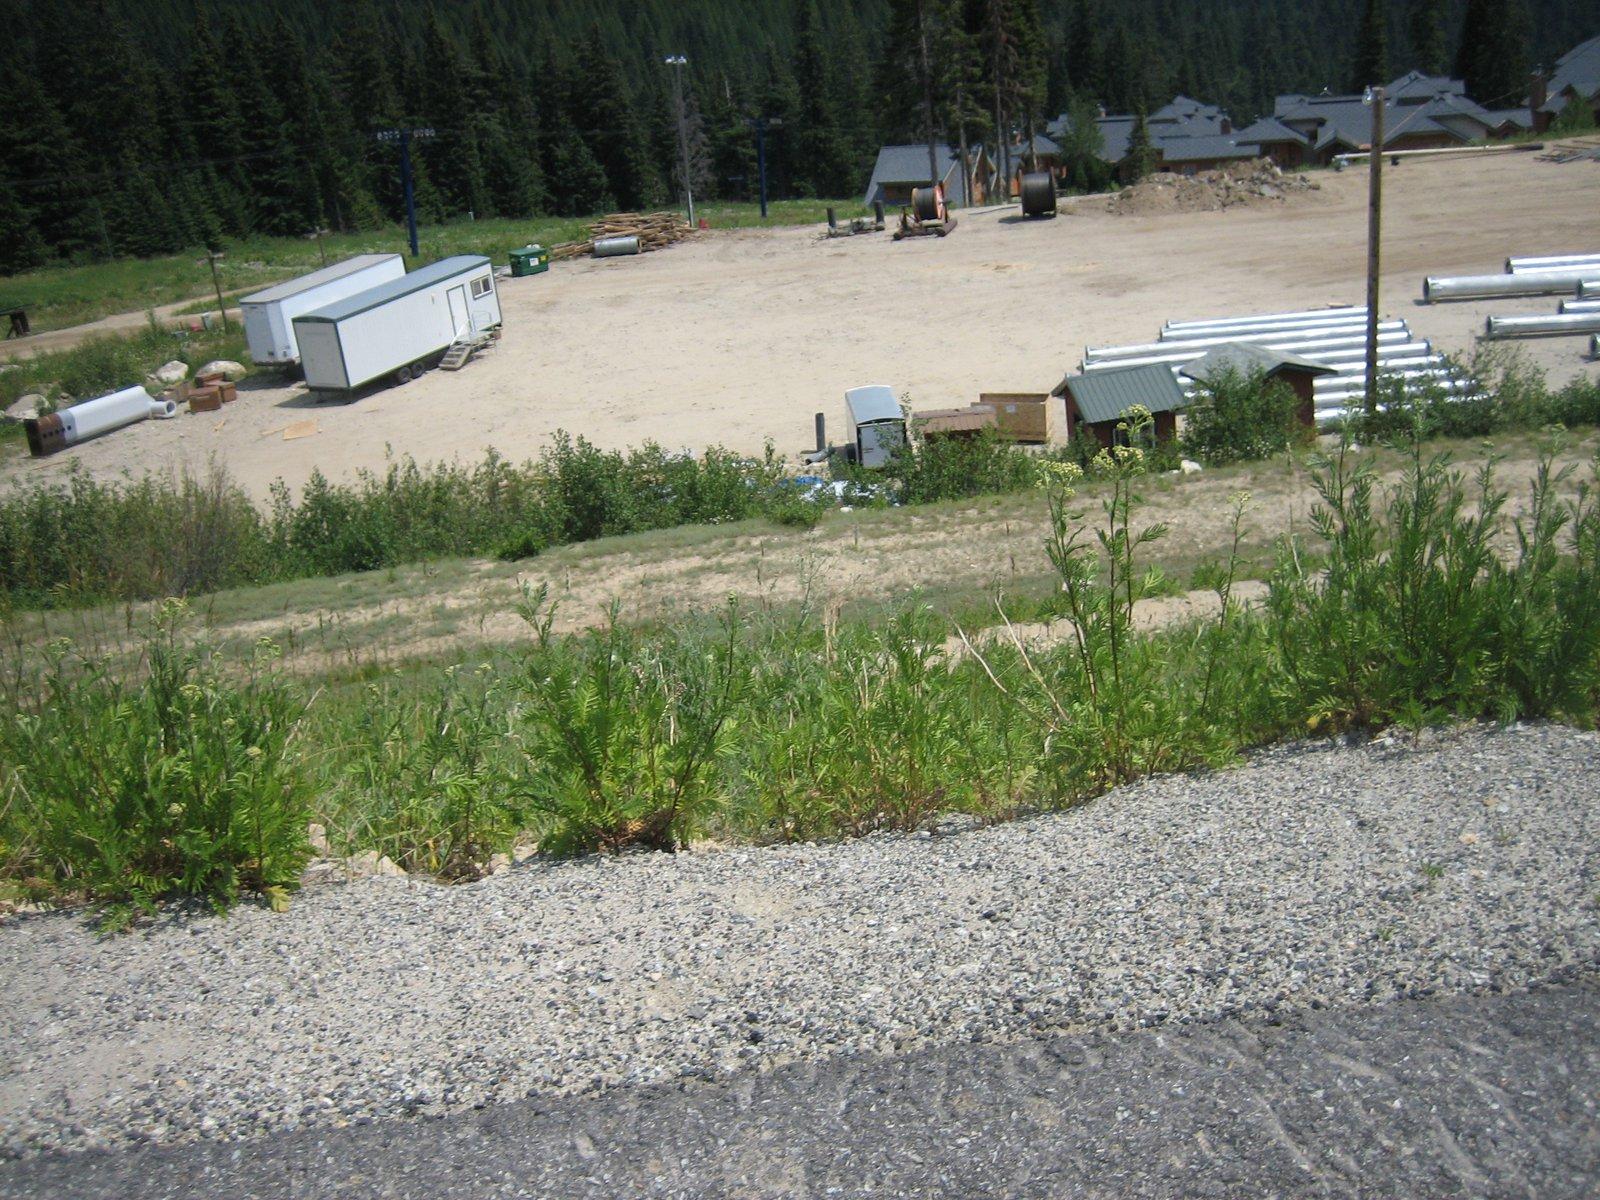 Construction at Schweitzer Mountain Resort, Summer 2007 - 4 of 8